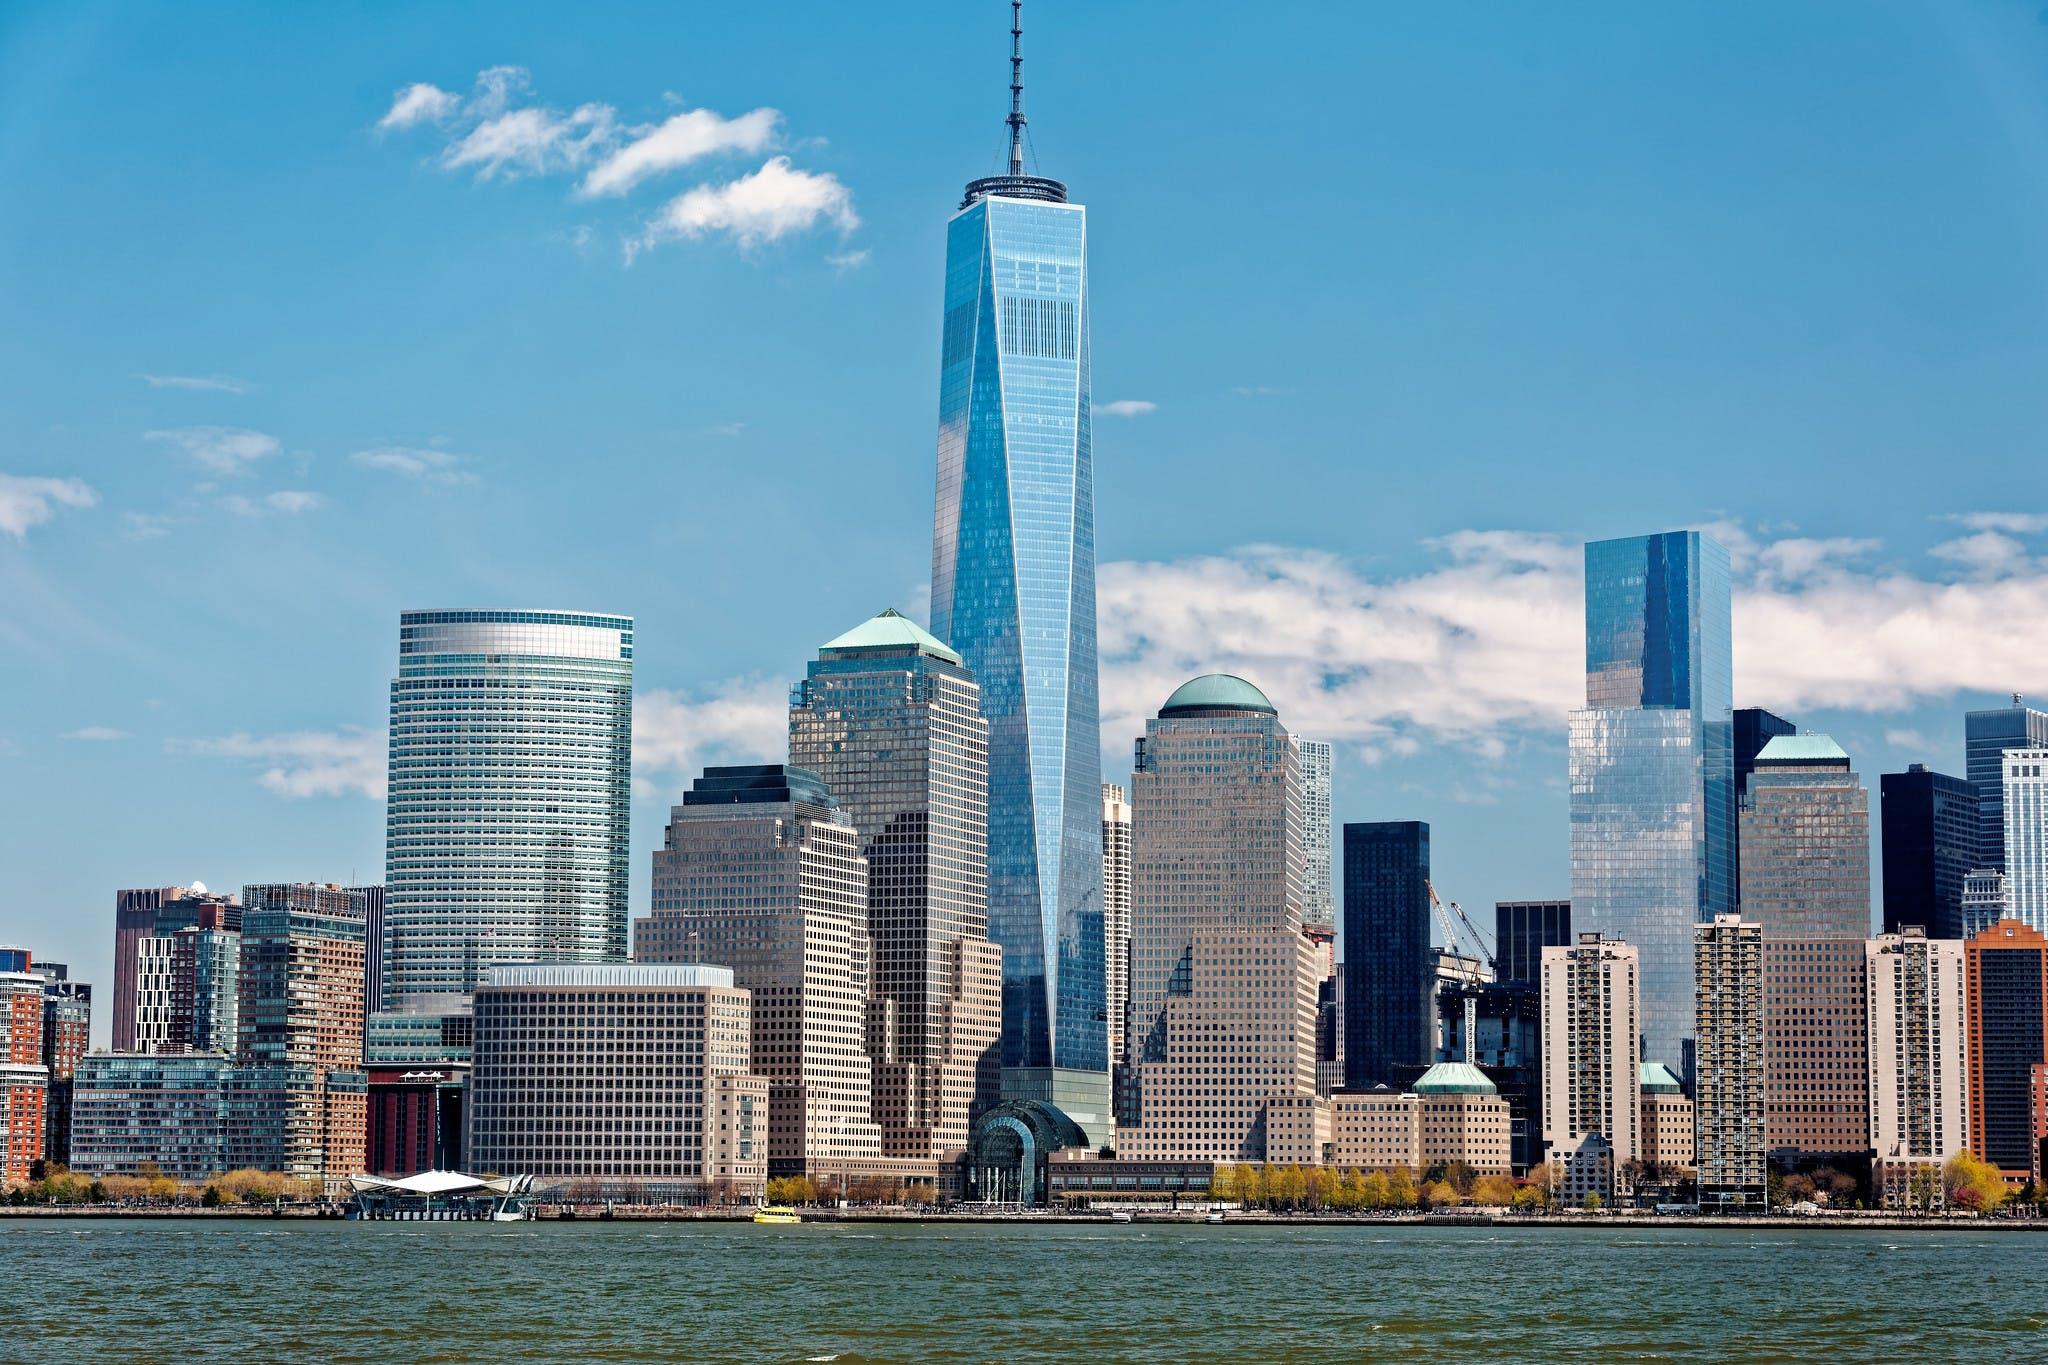 NYC Attractions  24fe7c1b77c71c7447fc482958e438b4